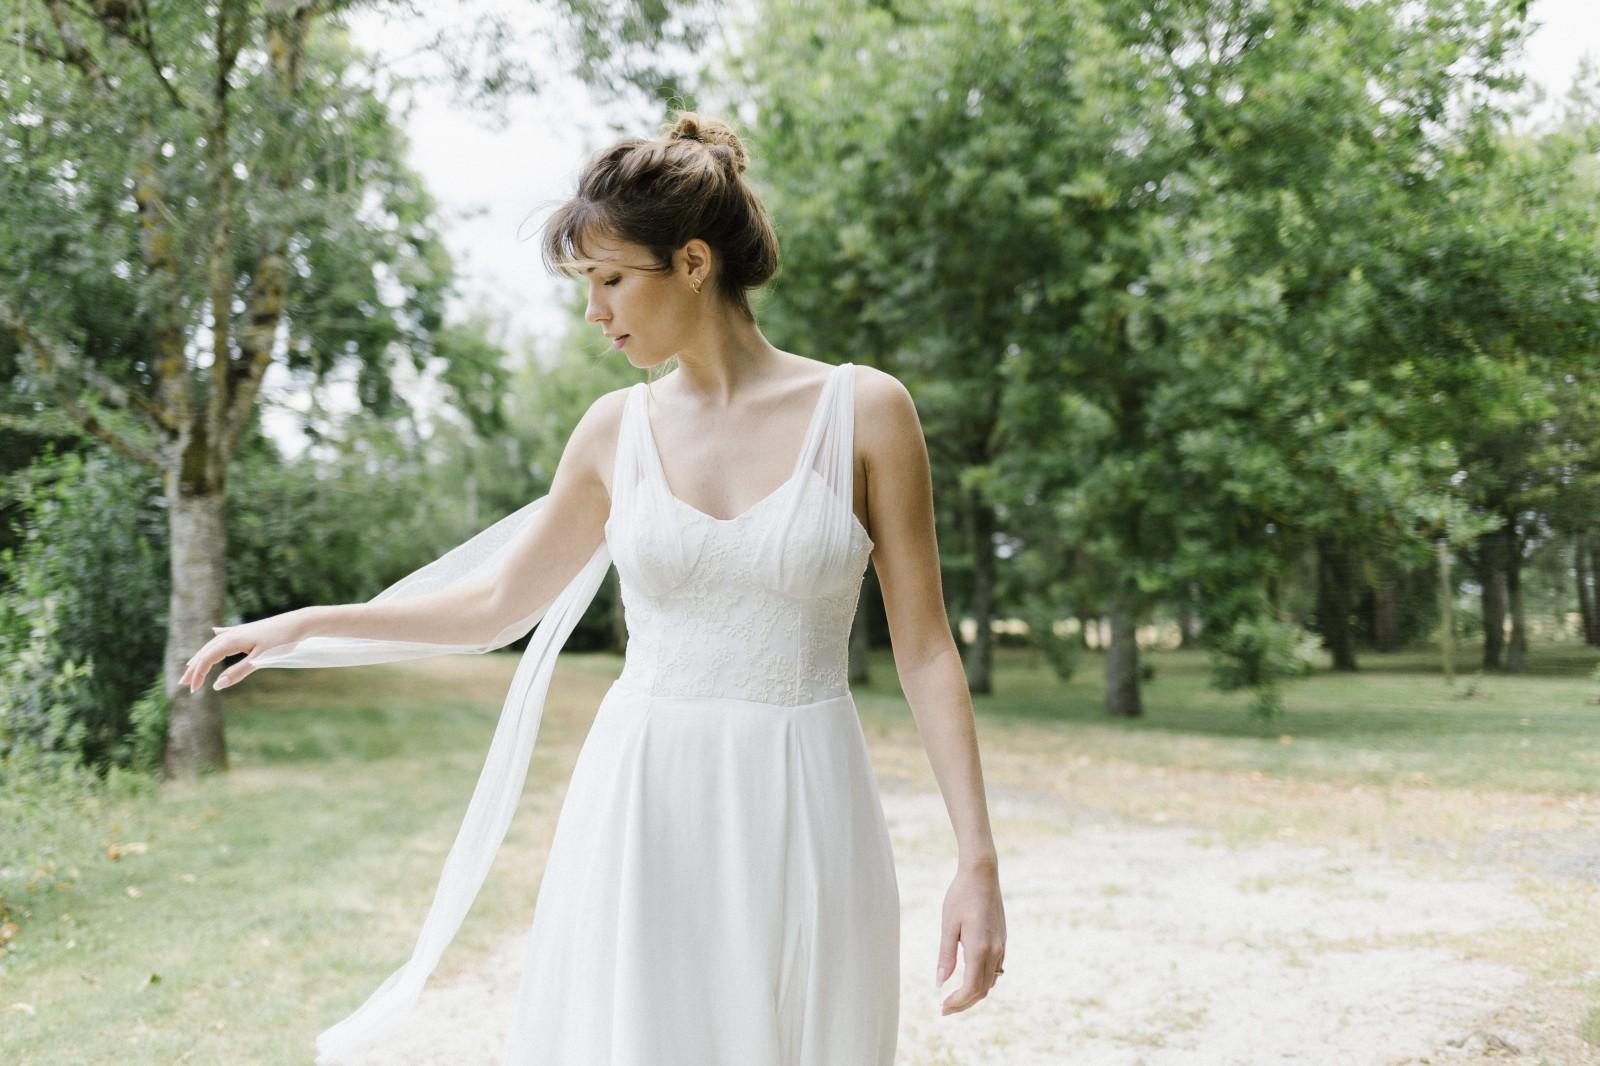 La robe Gaia est une robe de mariée zero dechet en tencel.